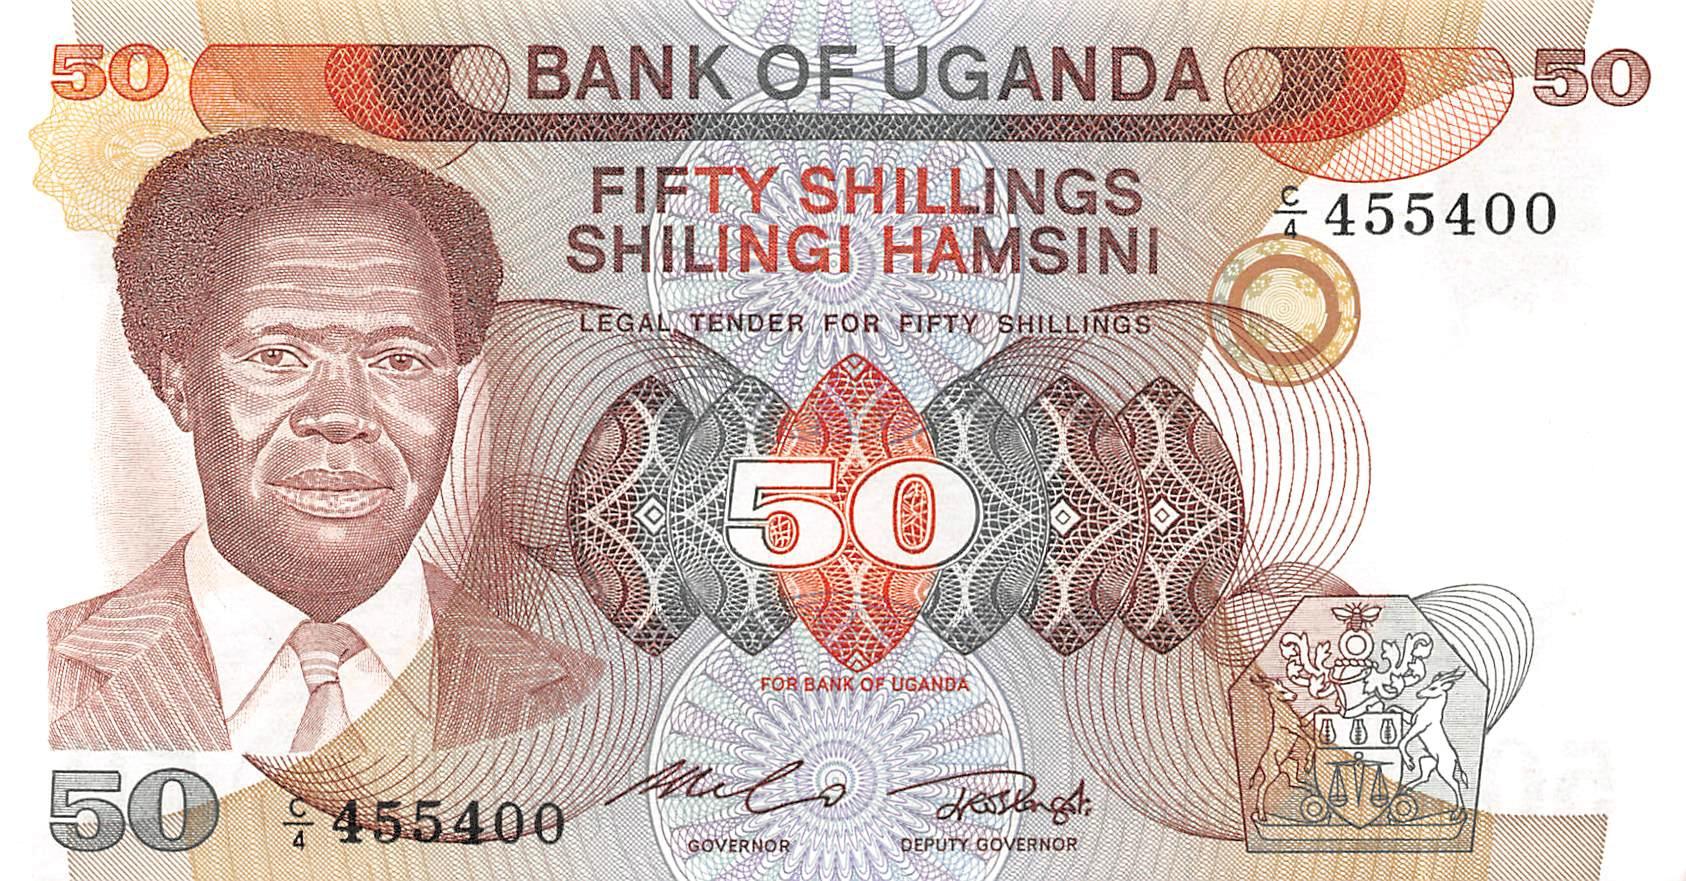 P-20 Africa Paper Money 1985 UNC Uganda 50 Shillings Banknote